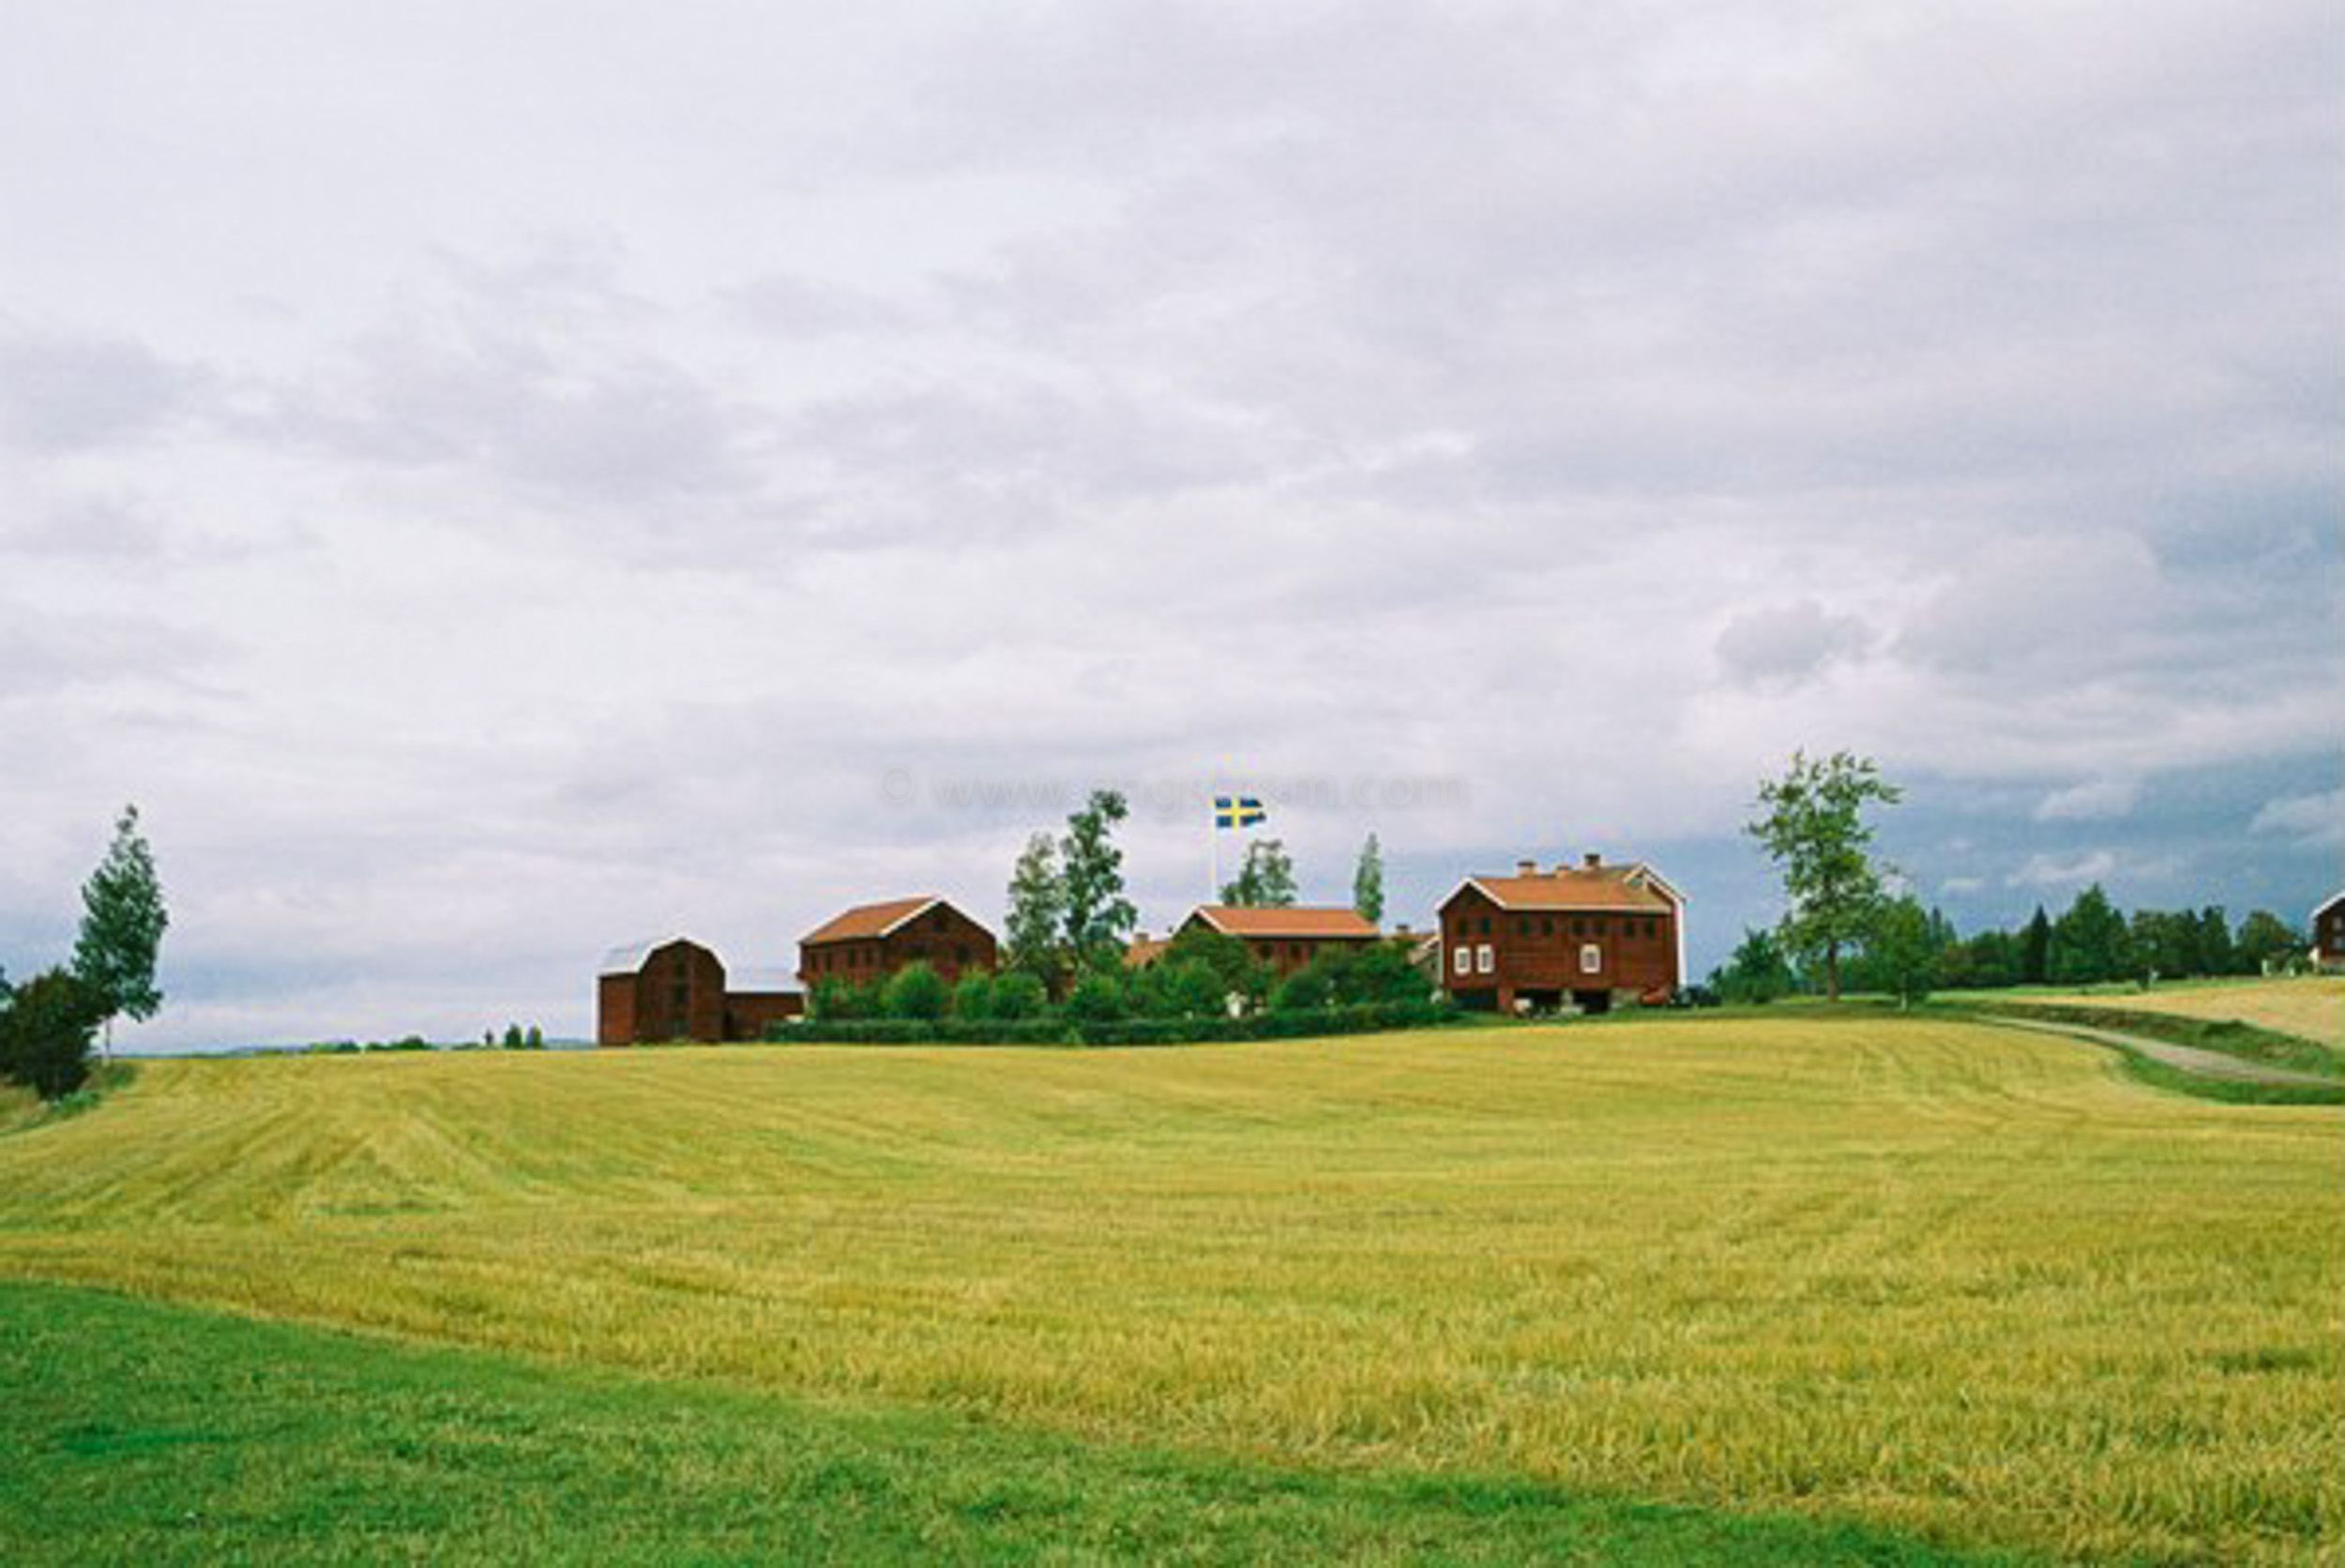 JE0425_180, Hälsingegård i Delsbo, Jonas Engström